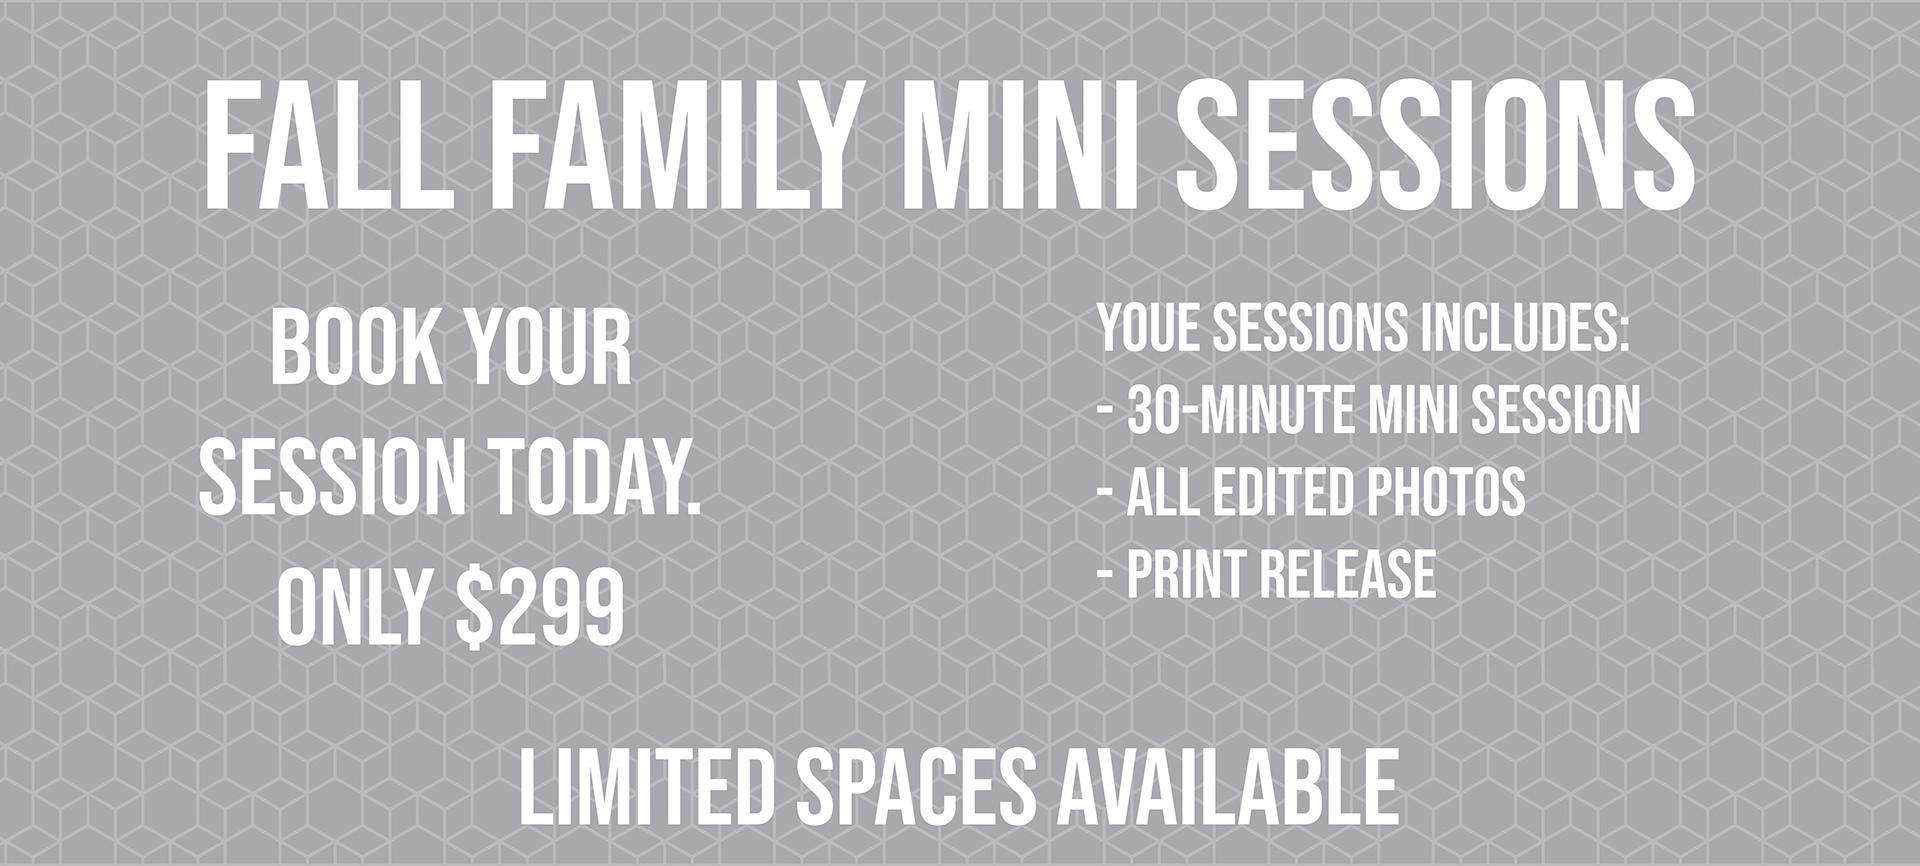 fall mini session details